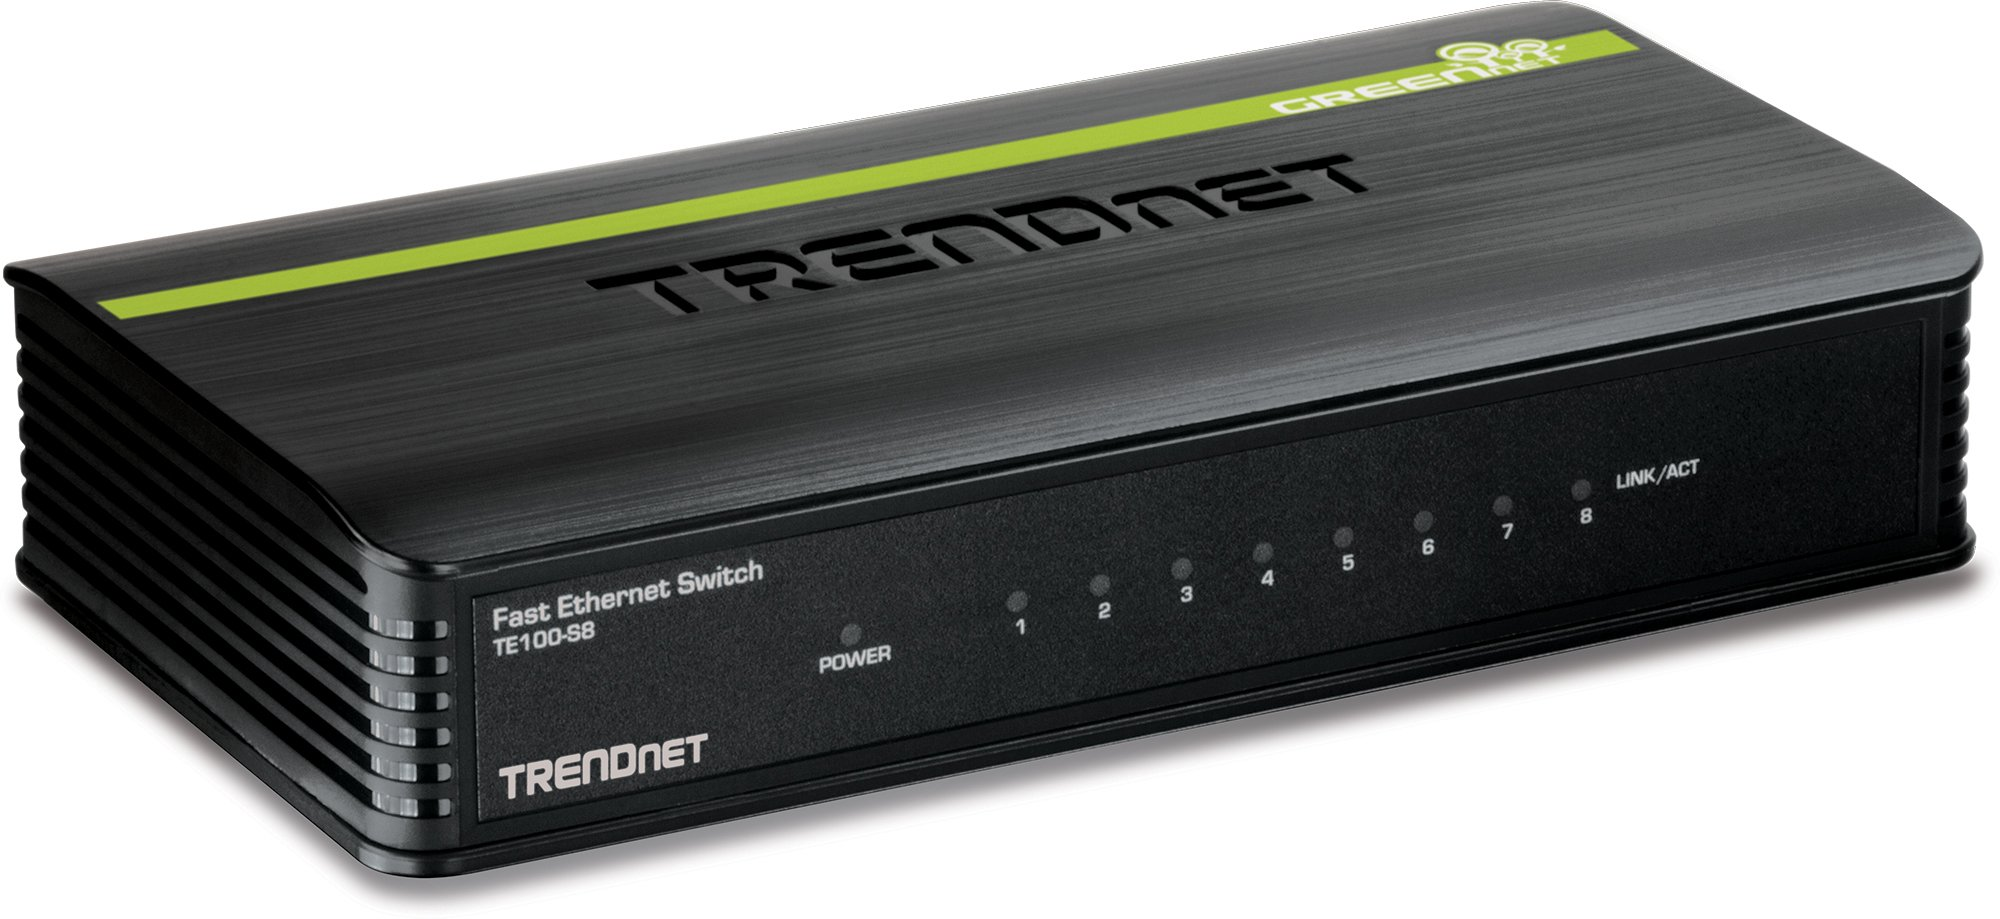 TRENDnet 8-Port Ethernet Switch (8 x 10/100Mbps Auto-MDIX RJ-45 Ports) TE100-S8 (Blue)